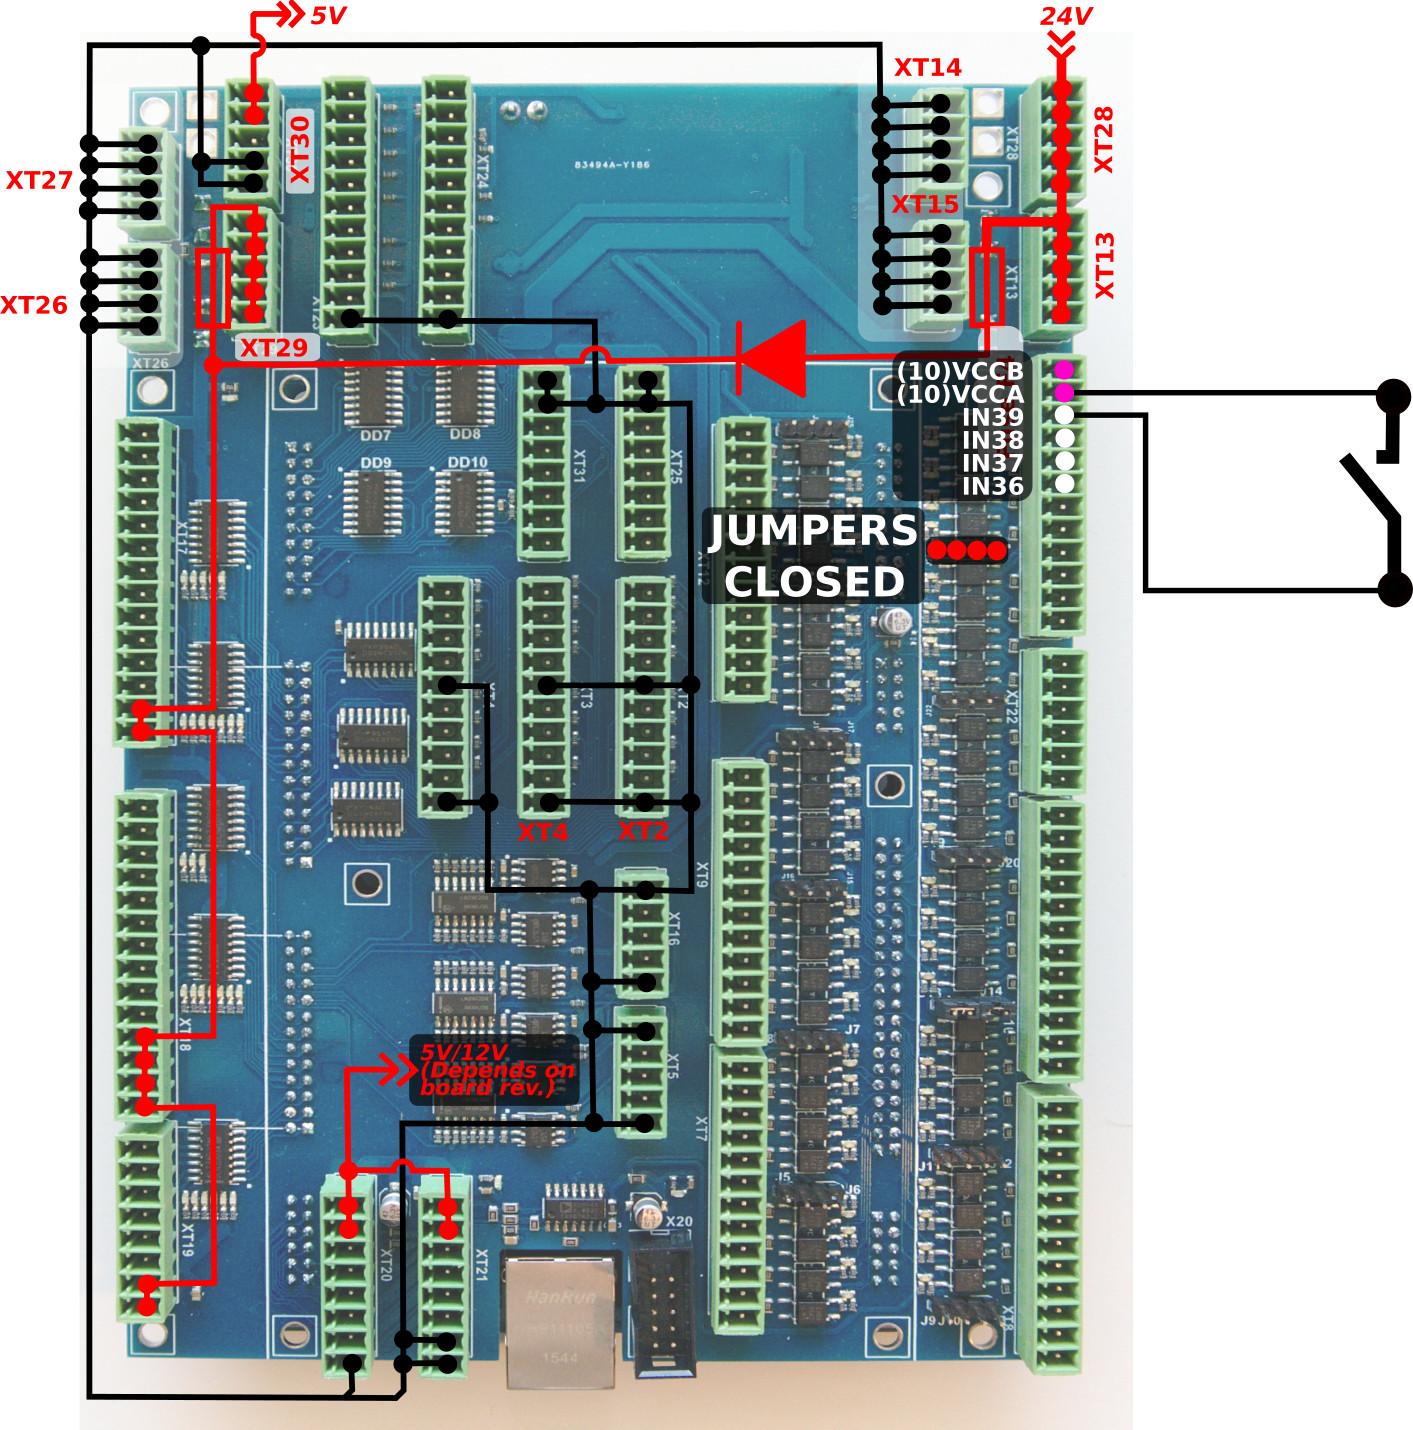 et10-j27-011-switch-internal.jpg